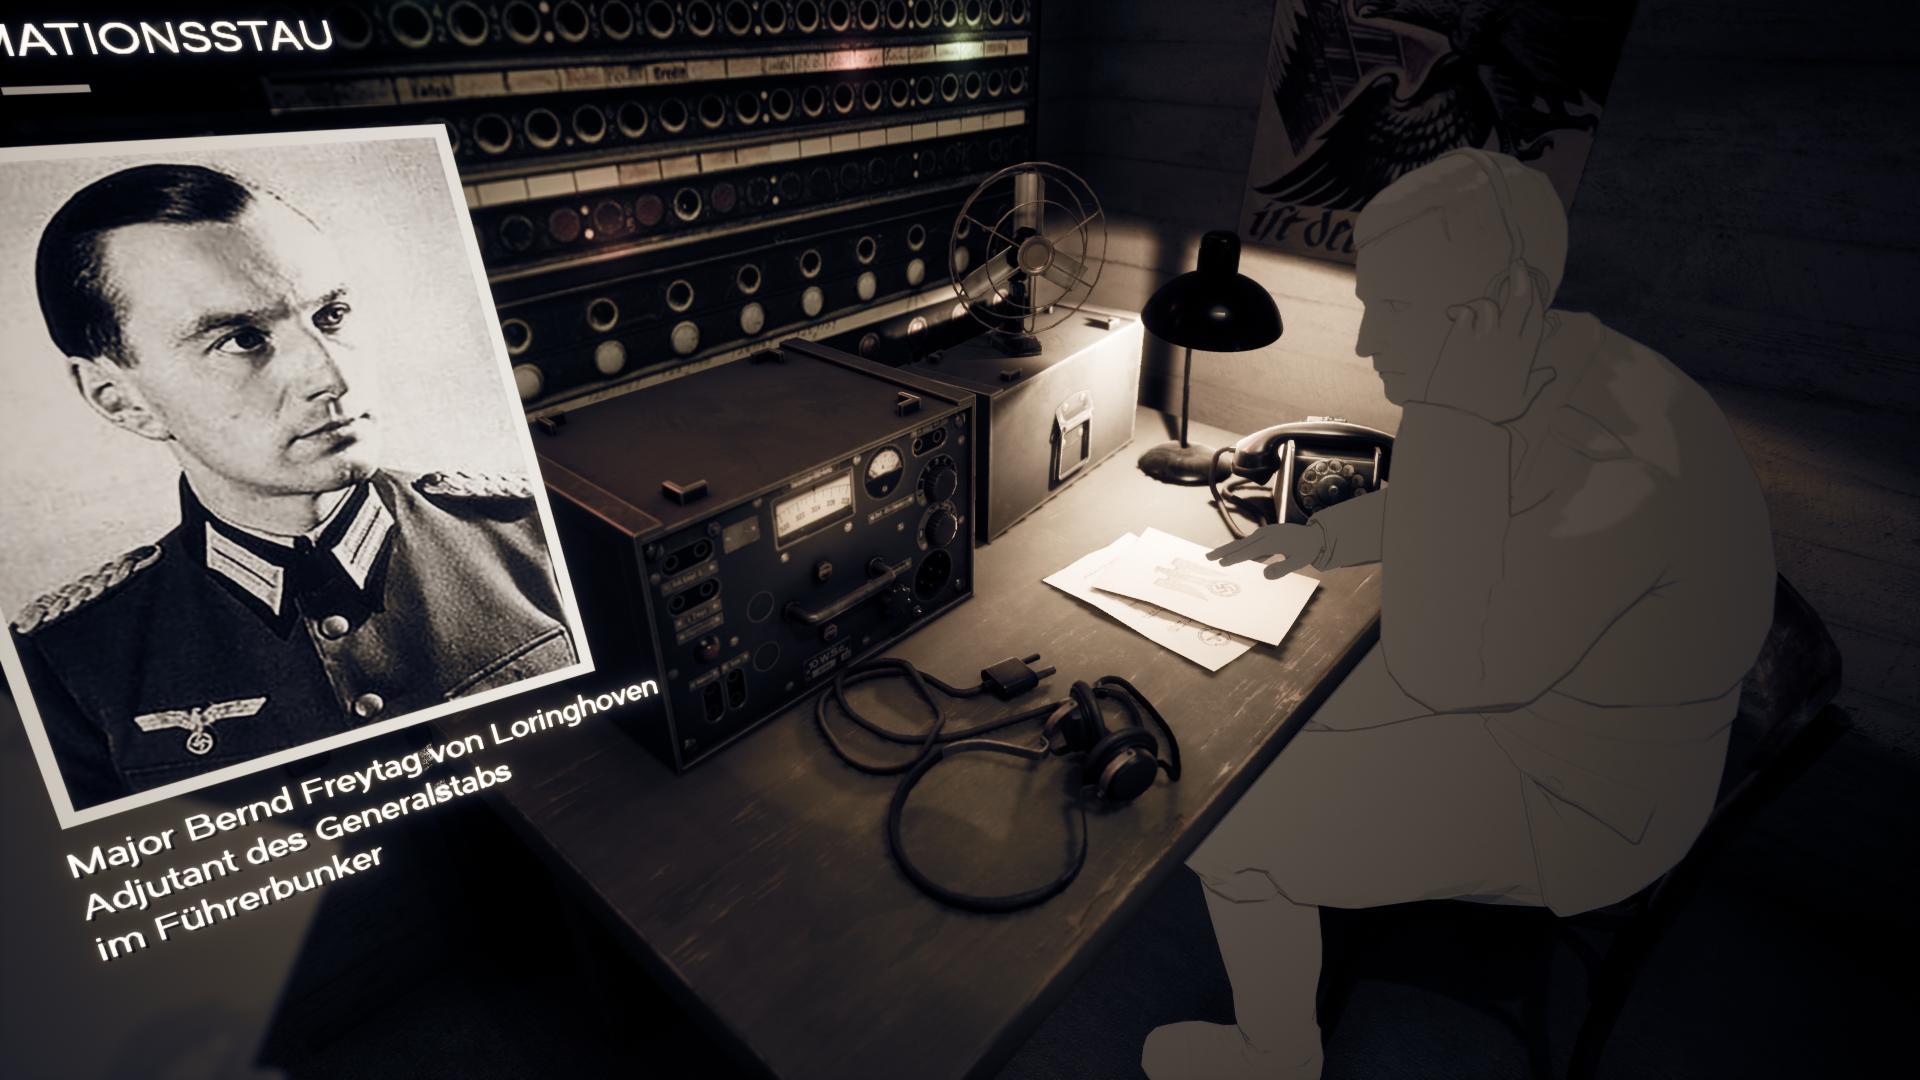 Führerbunker VR - Virtual Museum / Virtuelles Museum